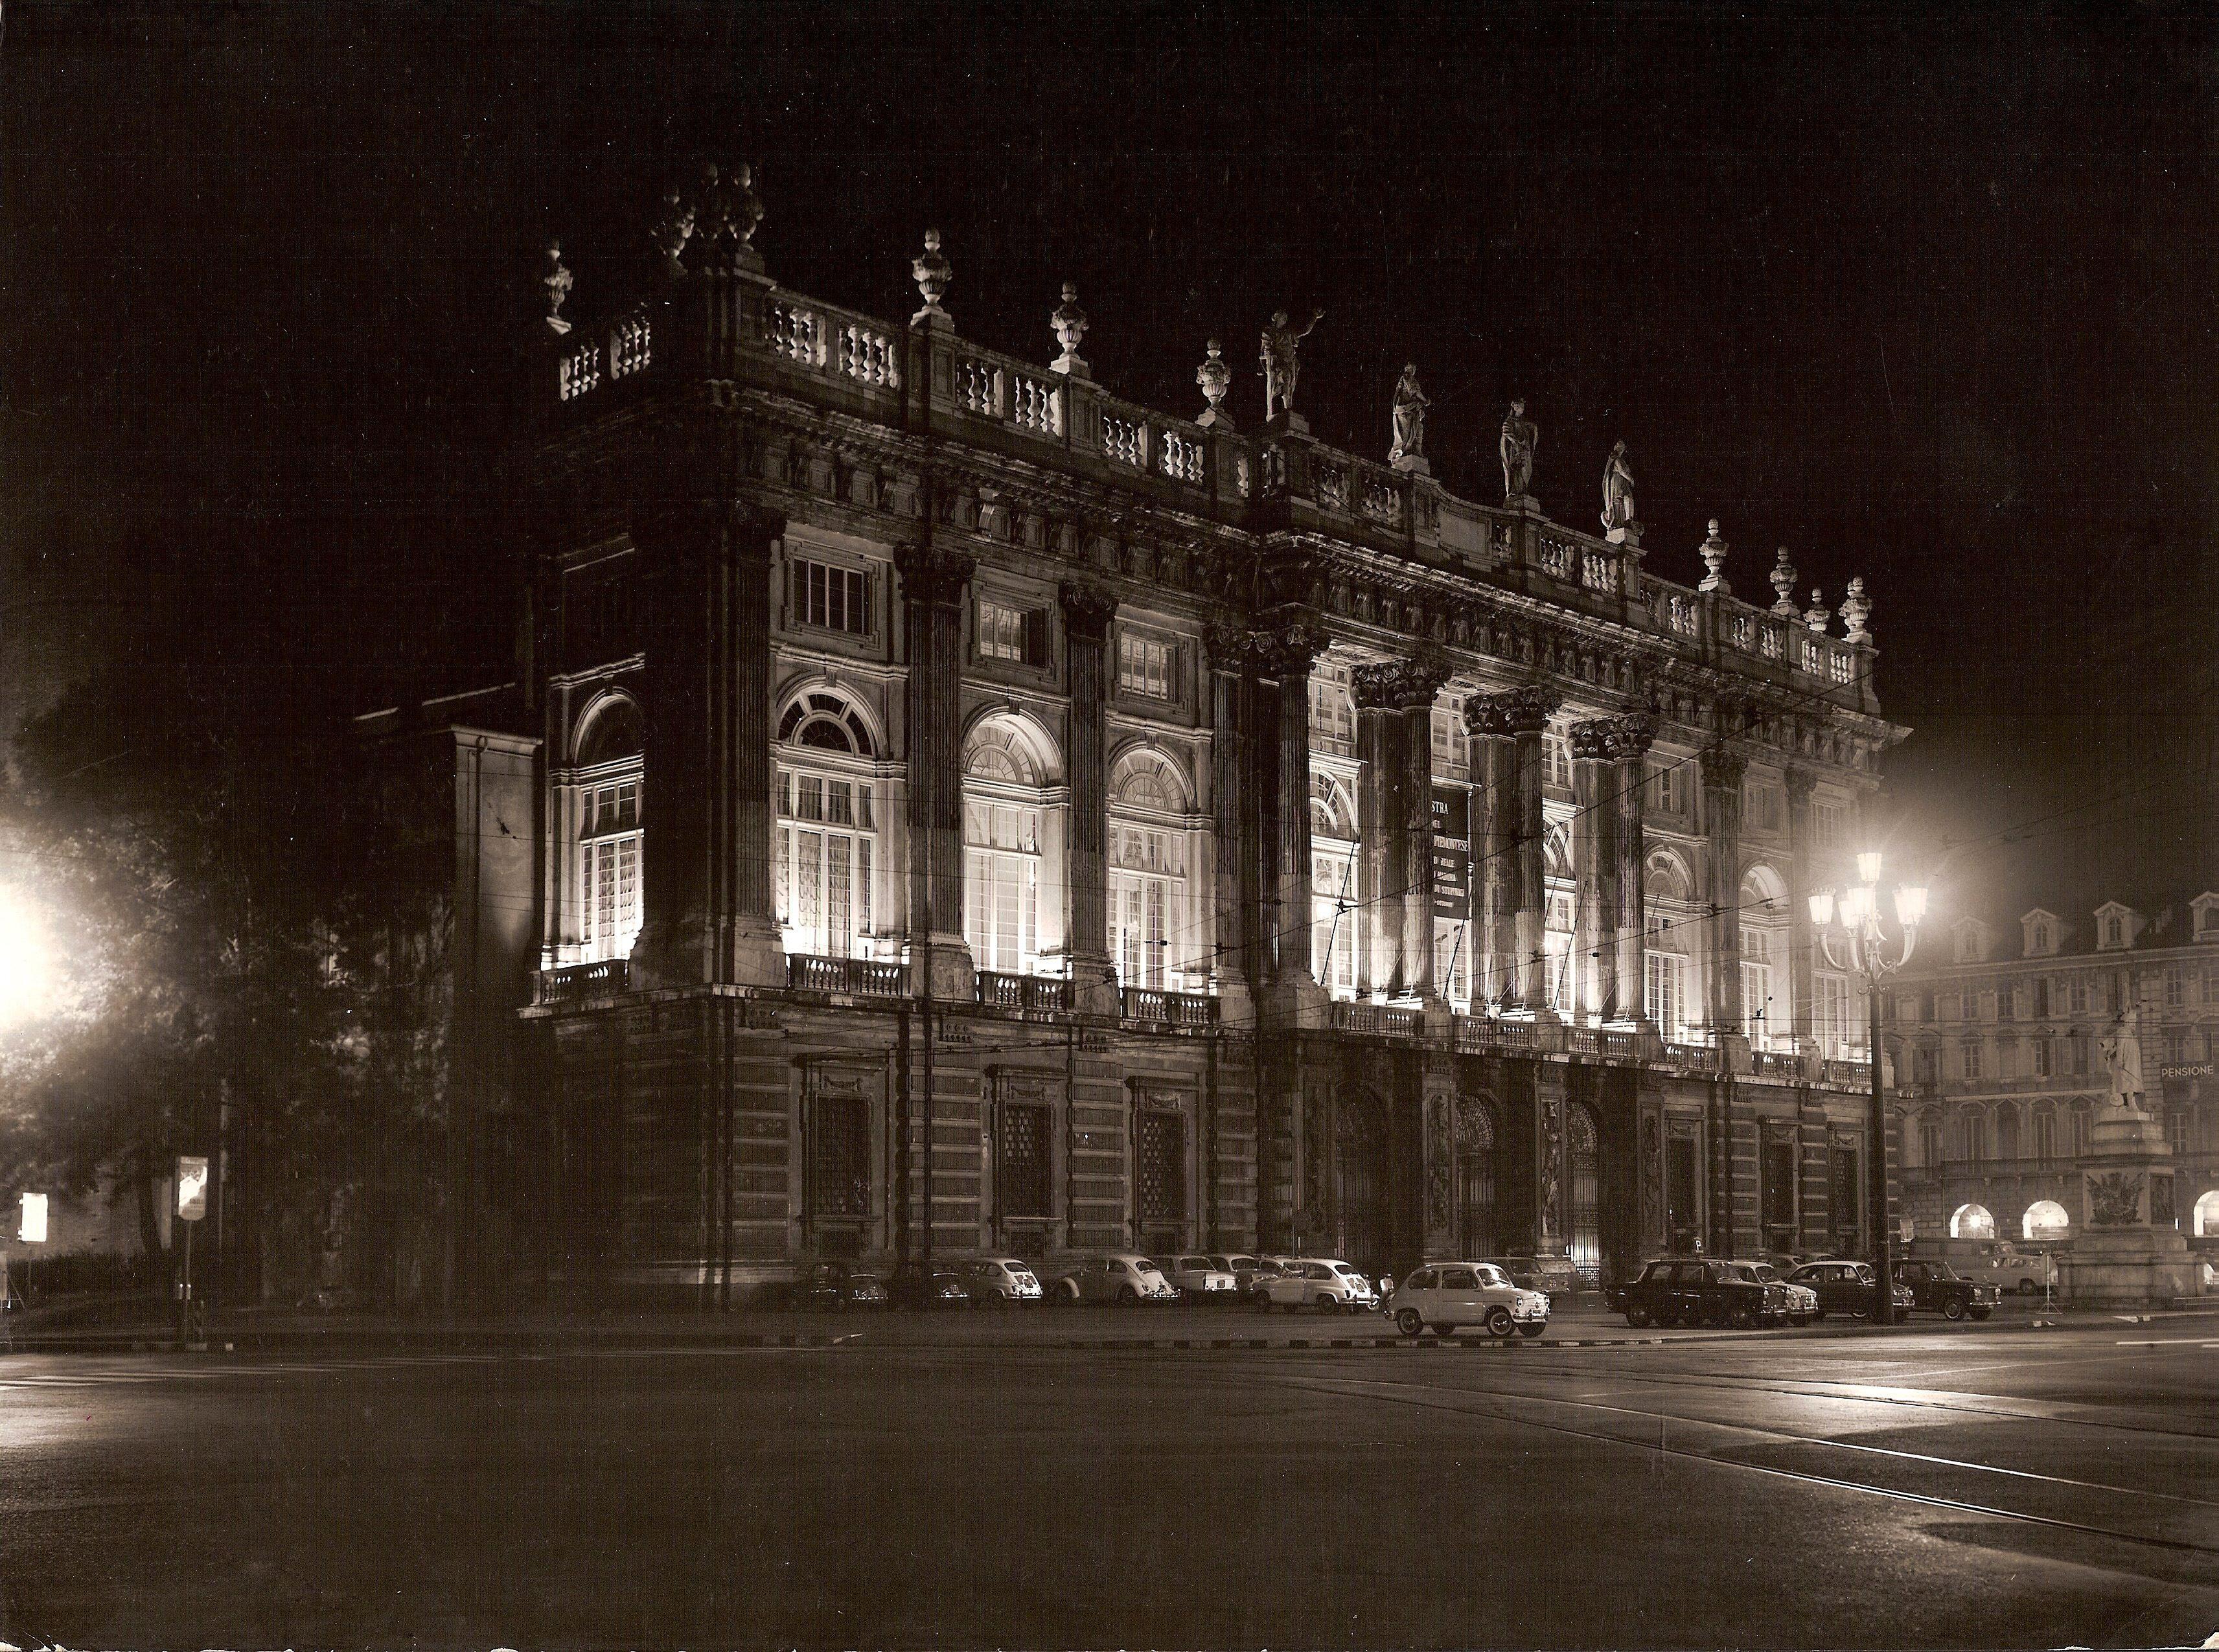 File:Illuminazione Palazzo Madama.jpg - Wikipedia